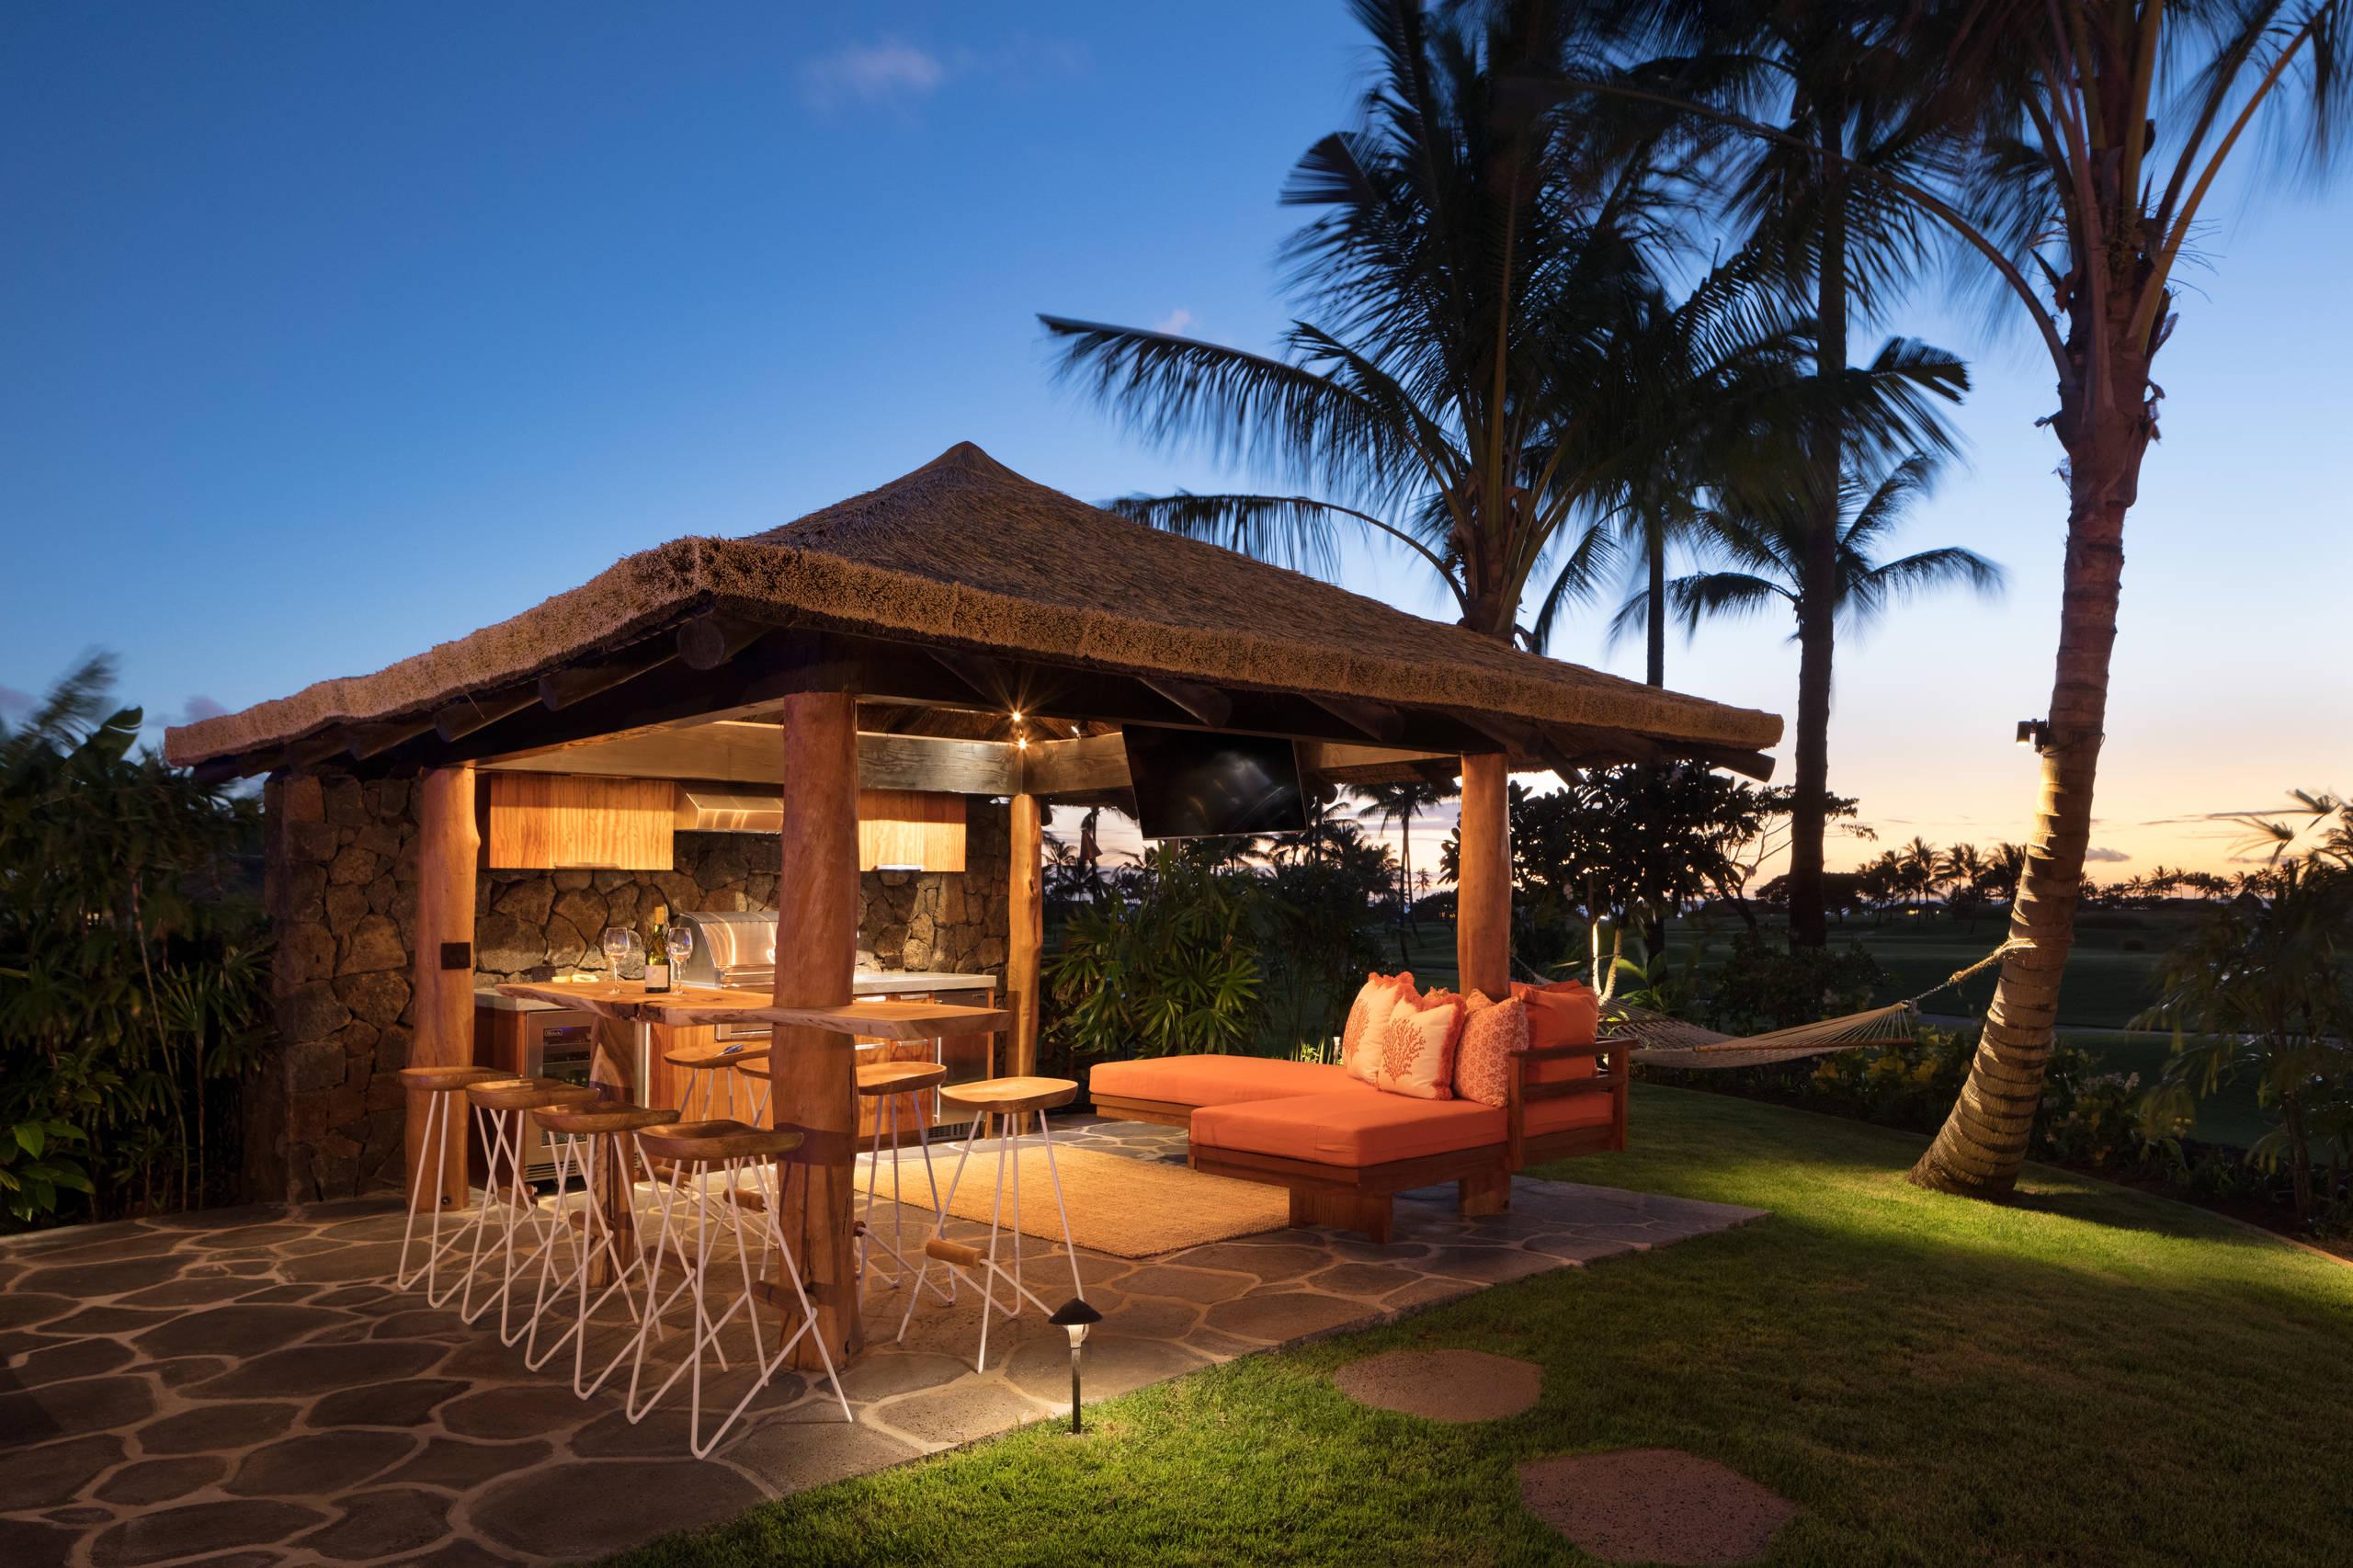 tropical outdoor kitchen design